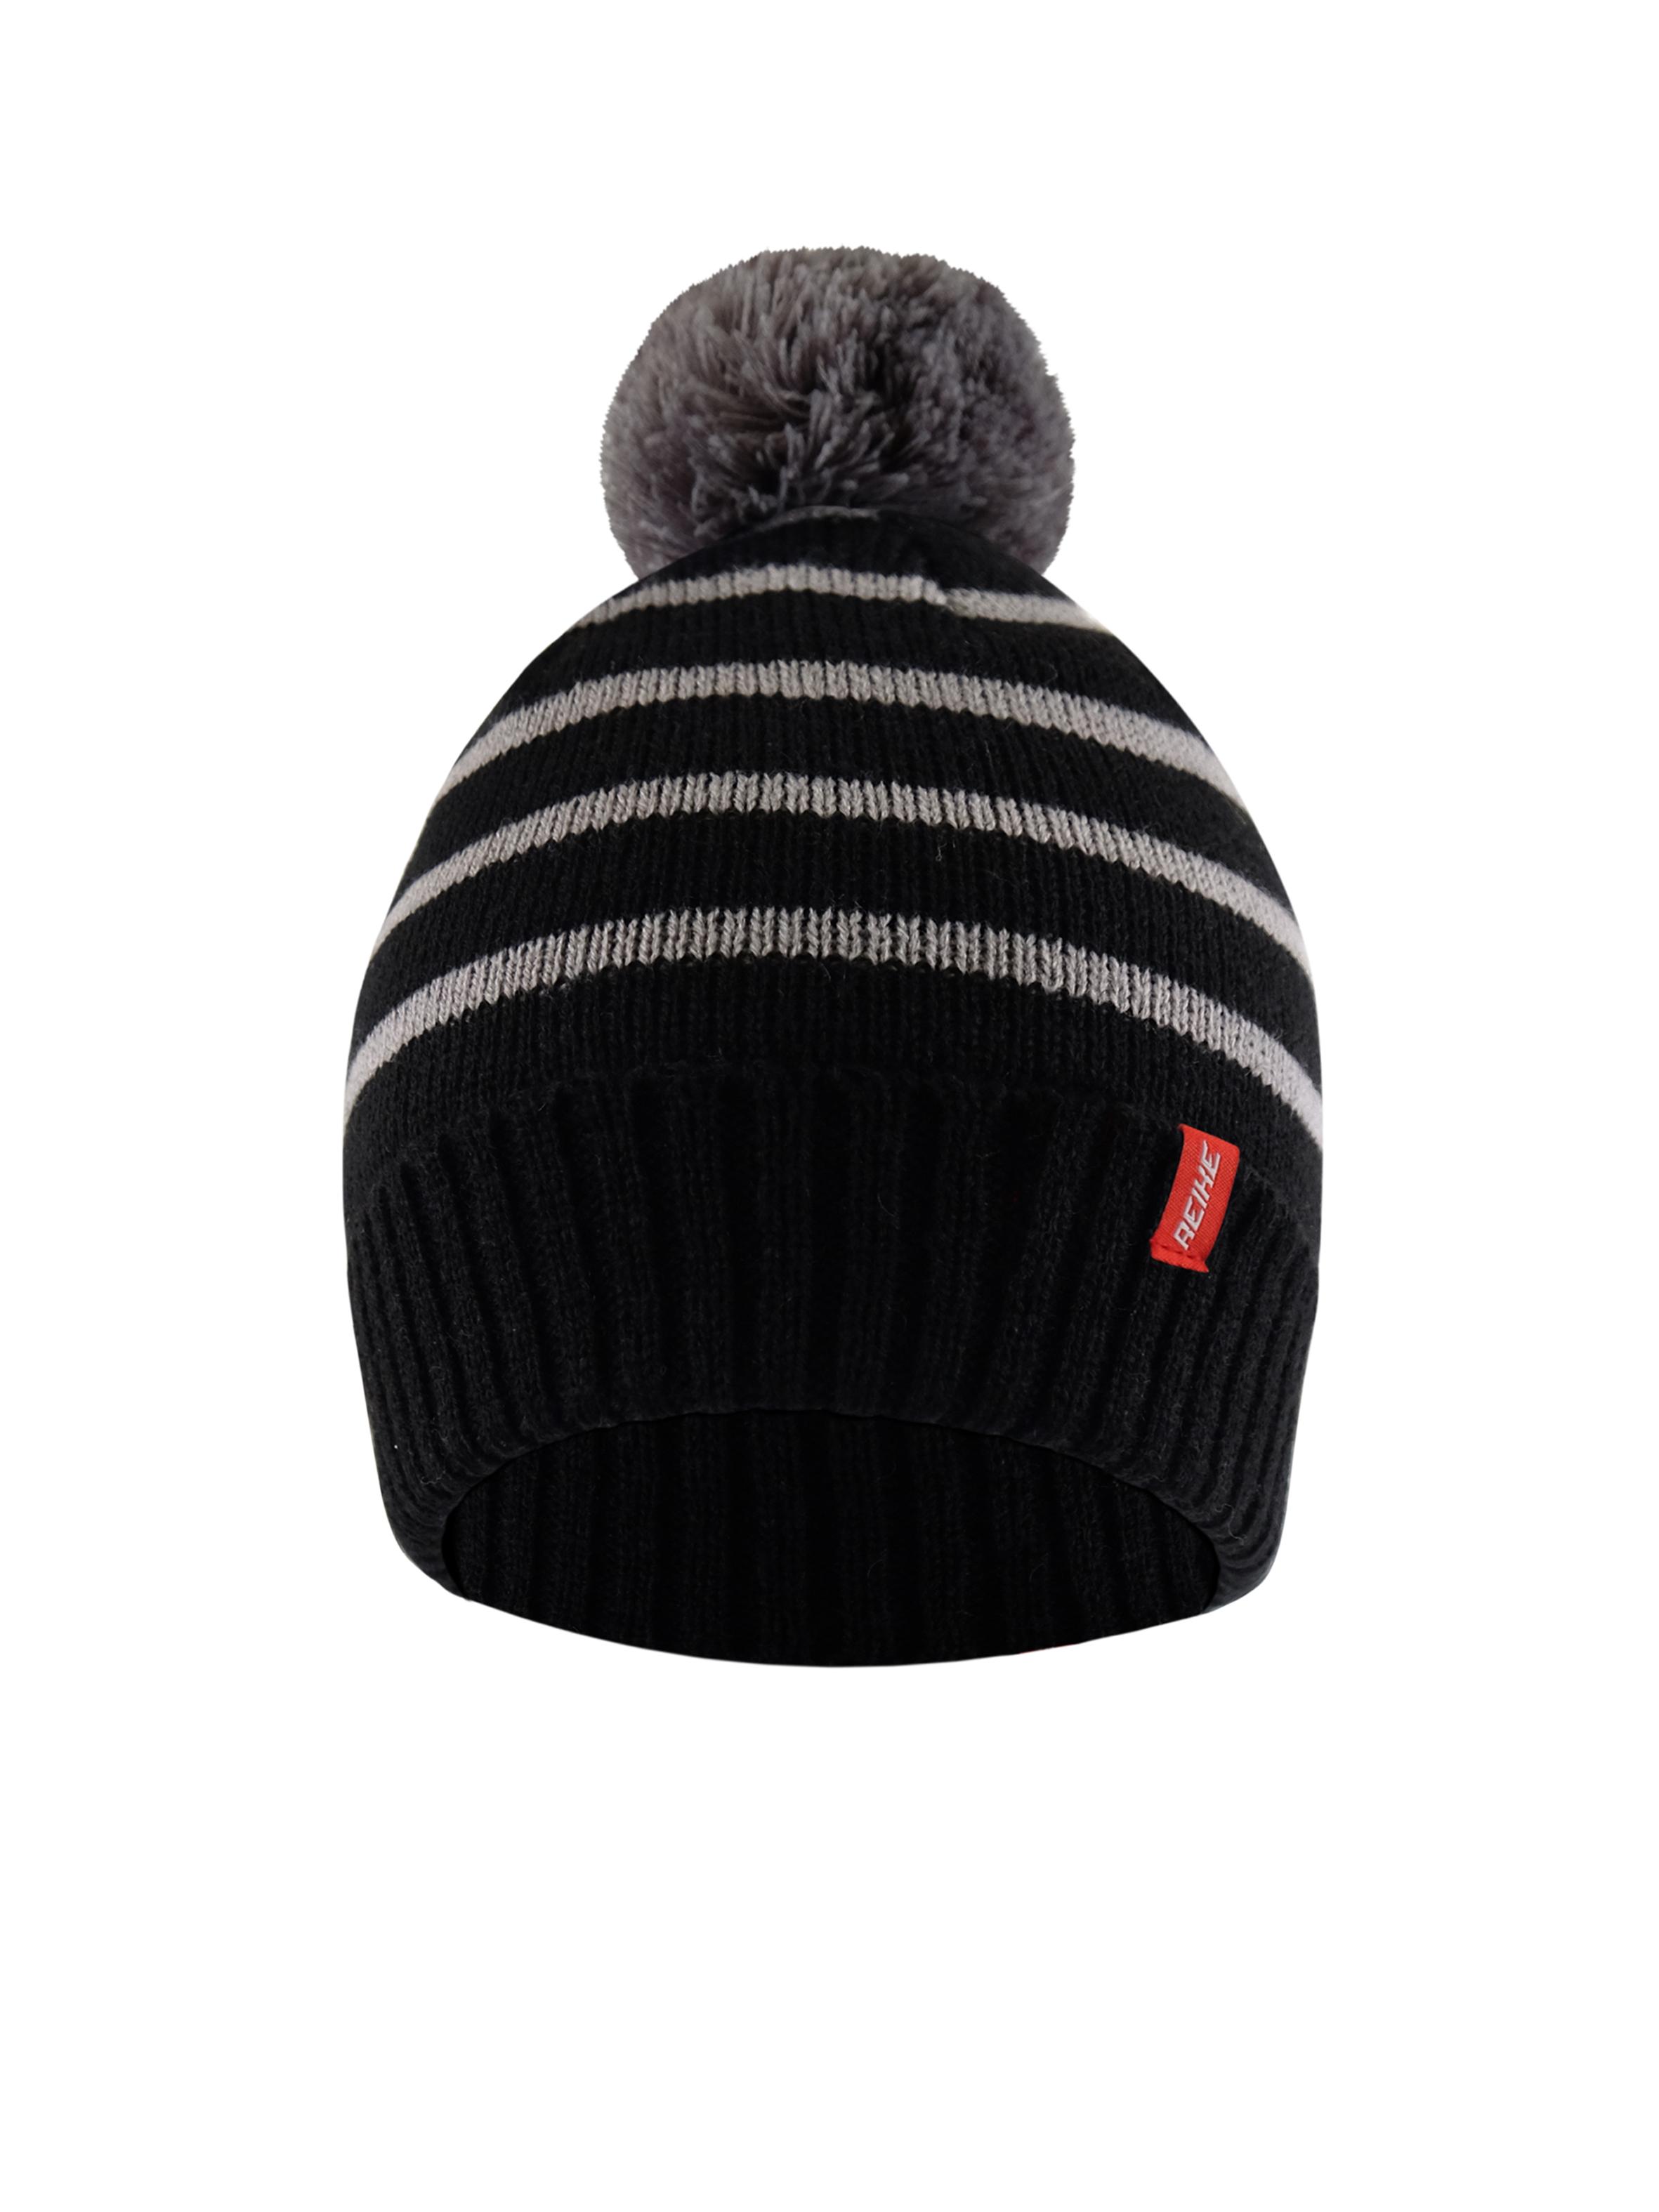 Купить Шапка для мальчика Reike GEO black, RKN2021-2 GEO black, р.52,